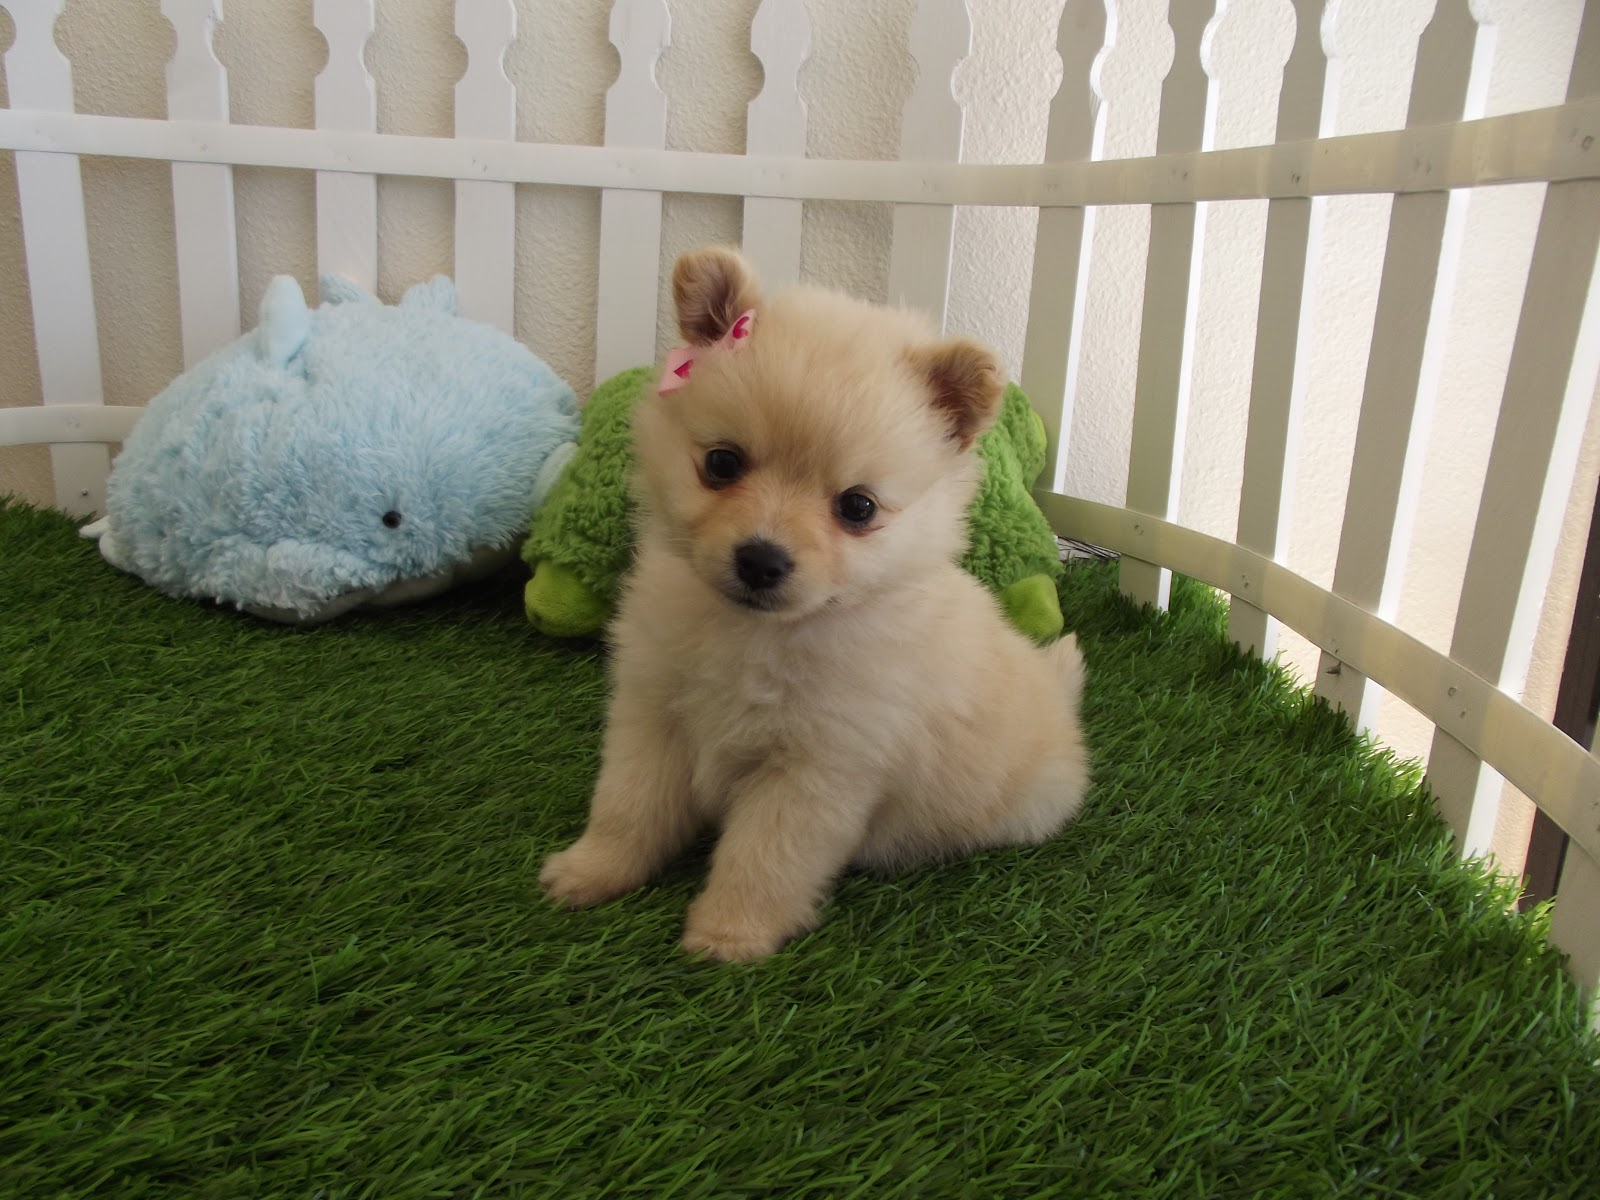 Cute puppies hd wallpapers - Kawaii wallpaper hd ...